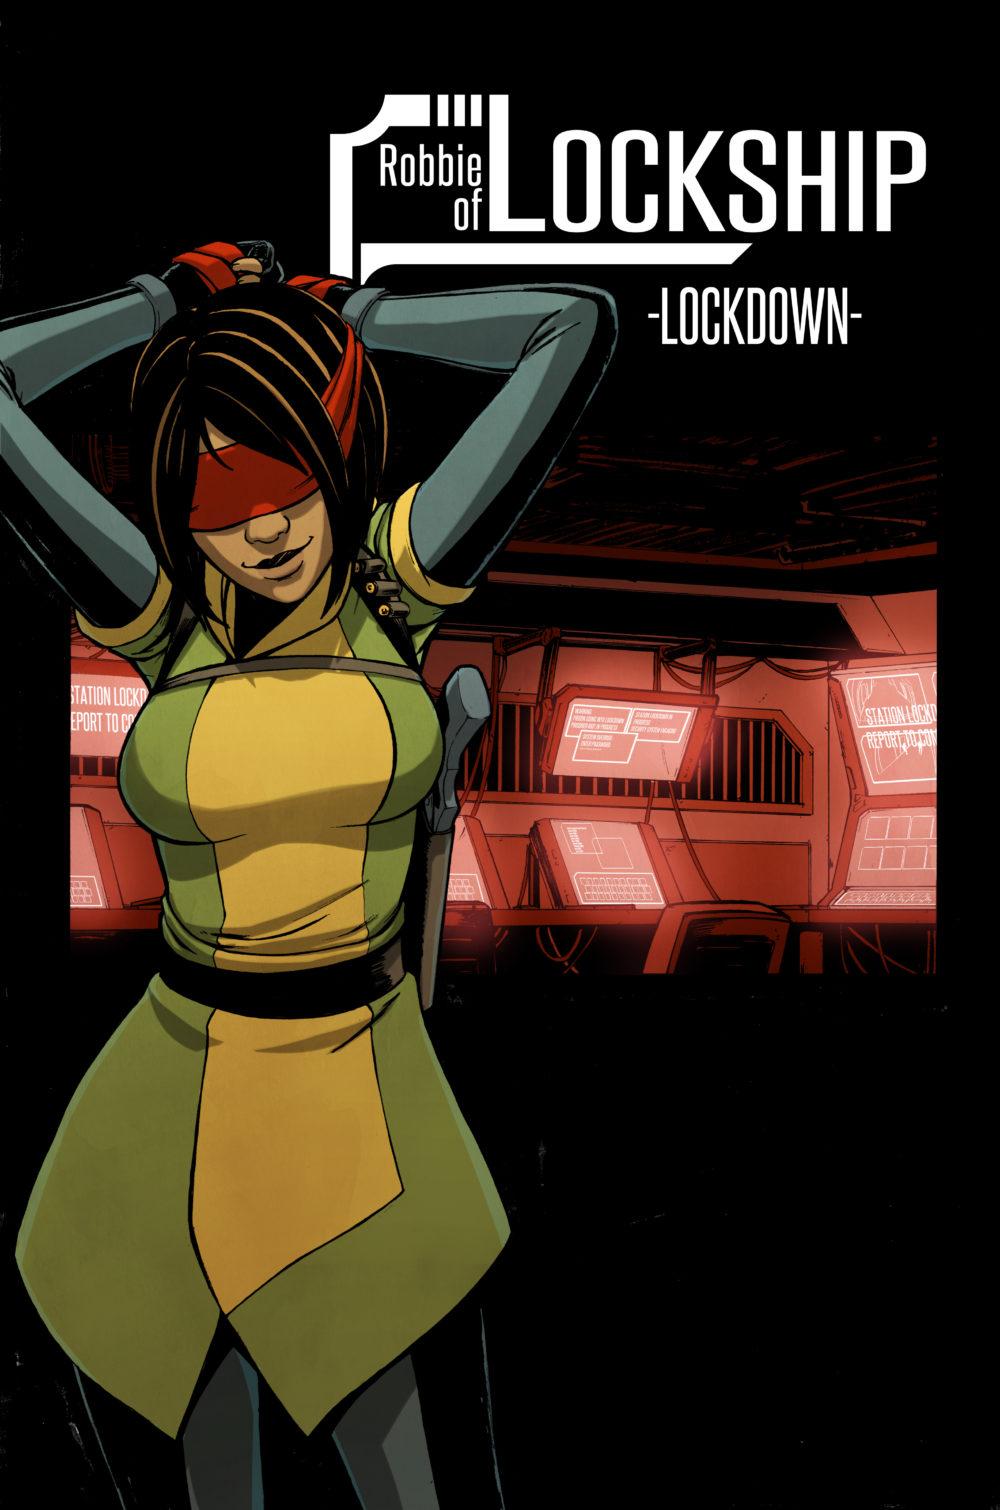 Chapter 02: Lockdown